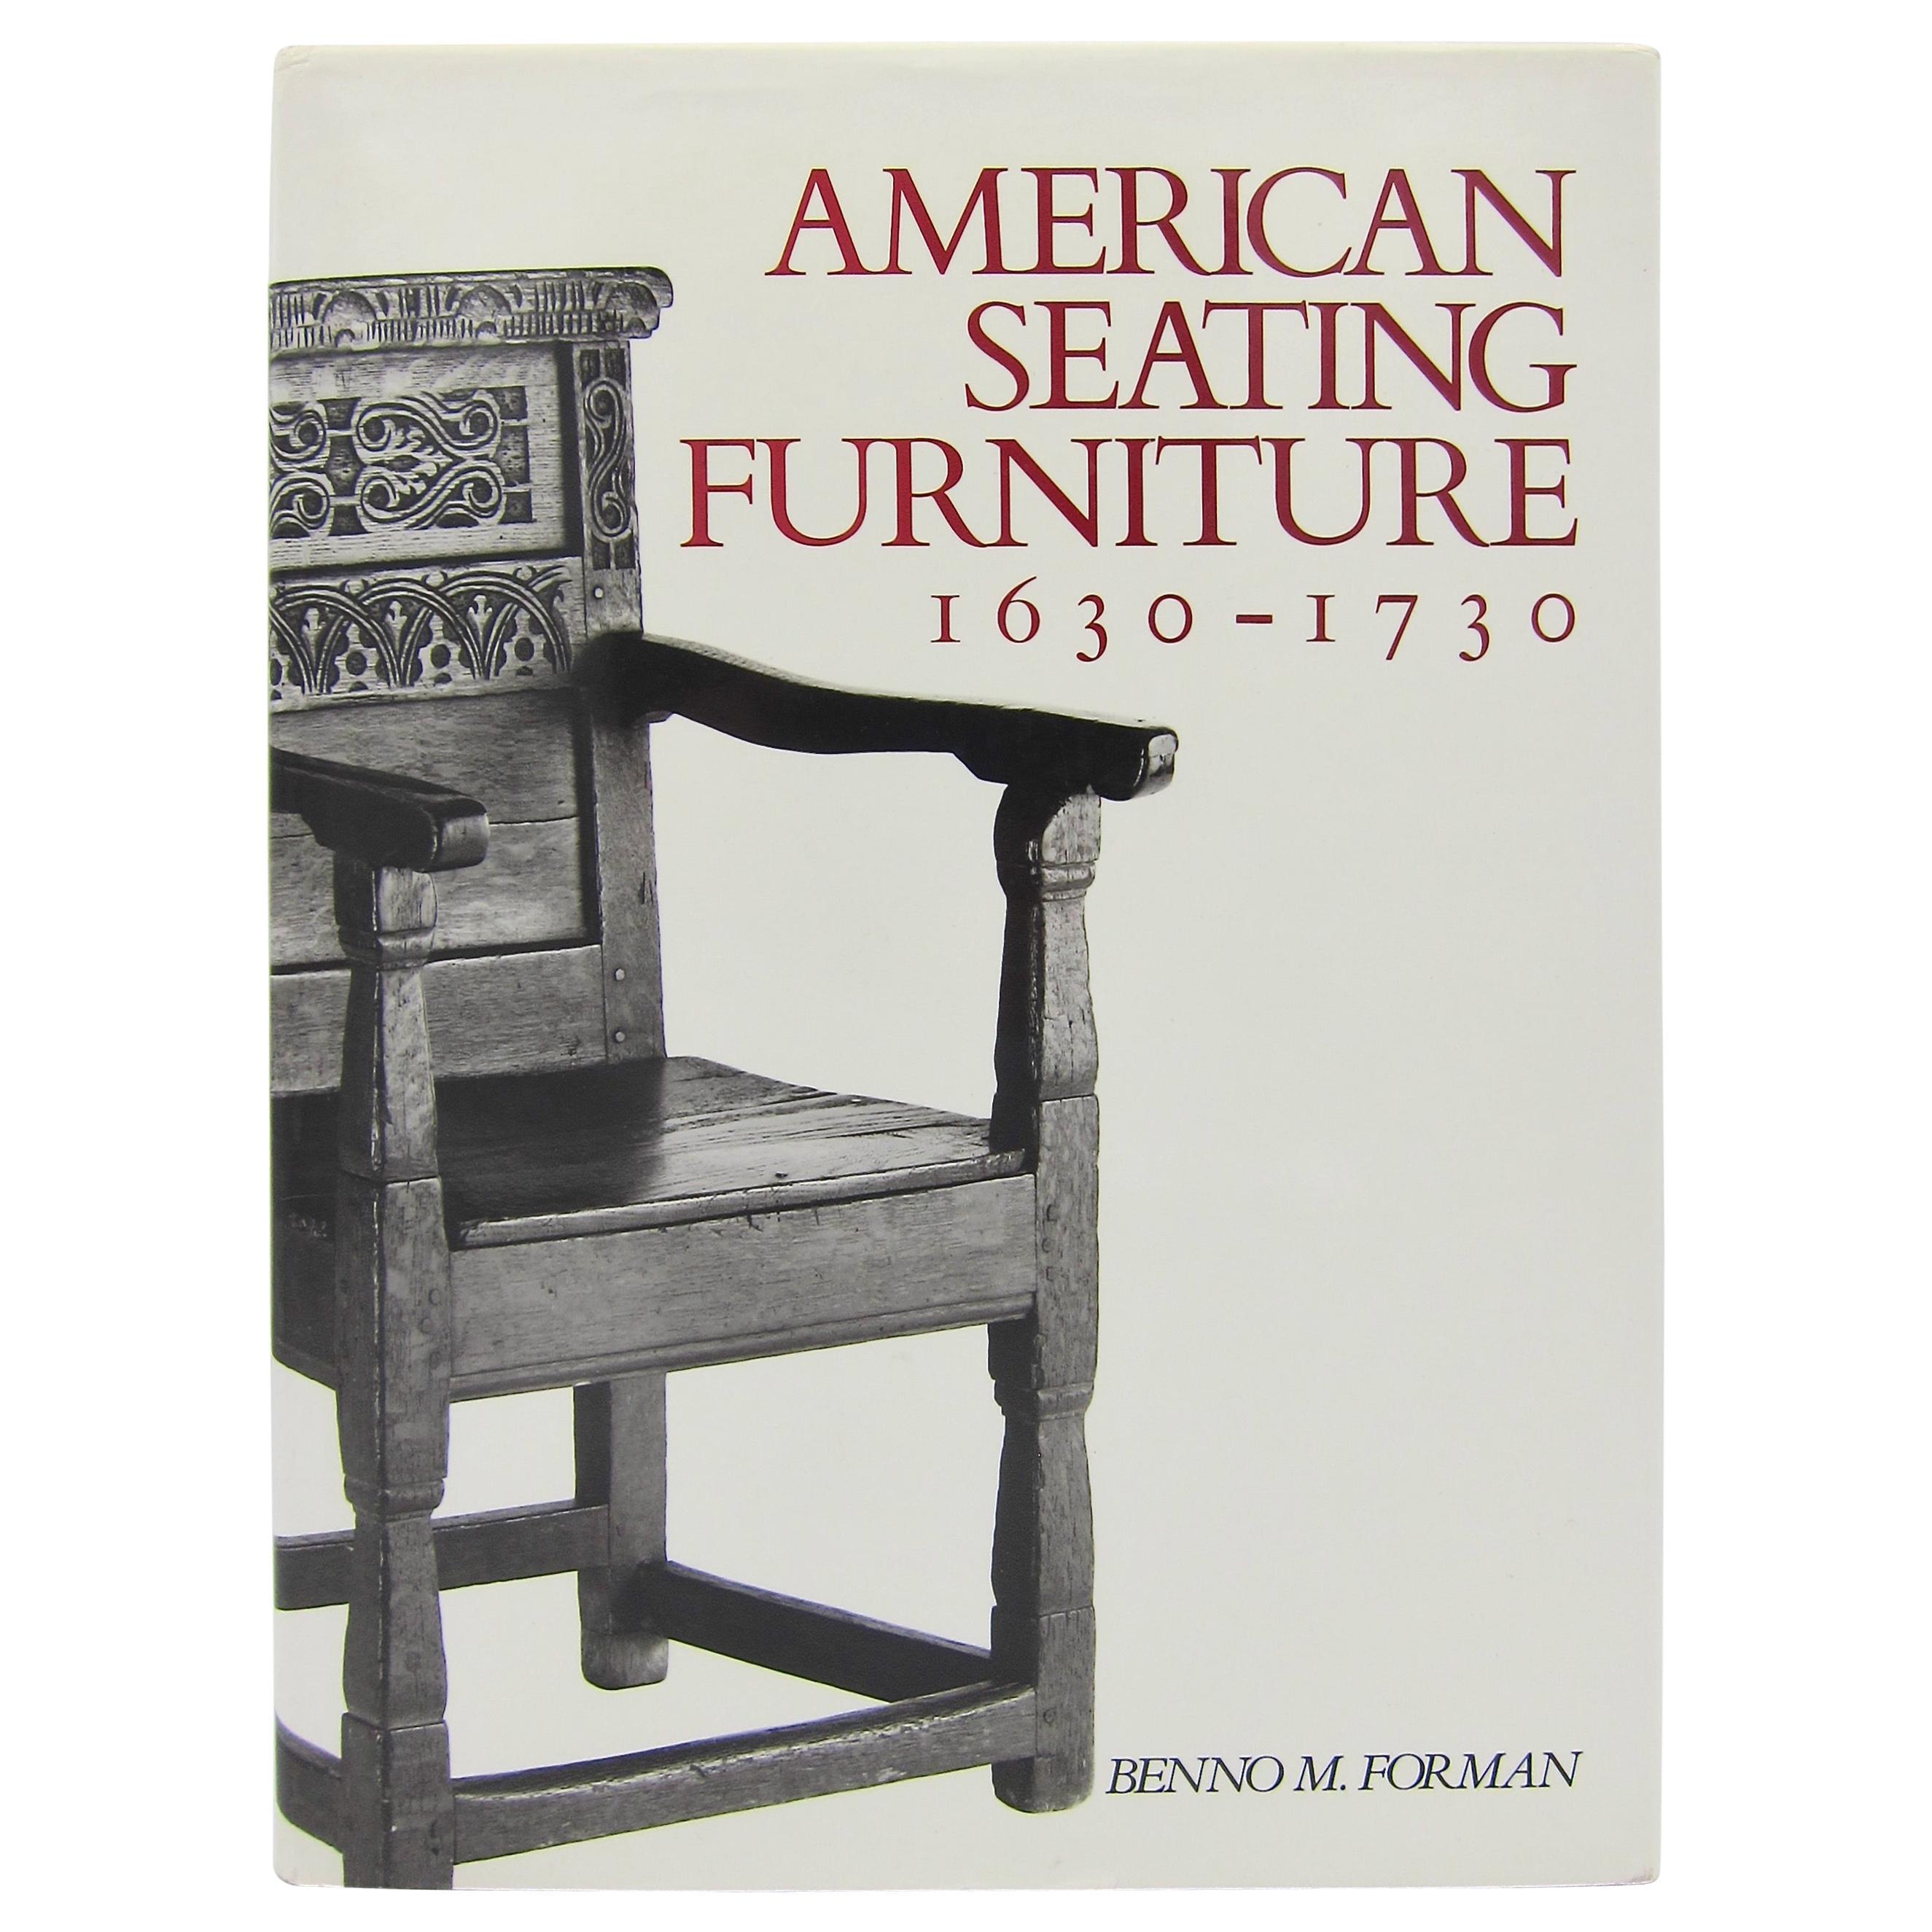 American Seating Furniture, 1630-1730 An Interpretive Catalogue